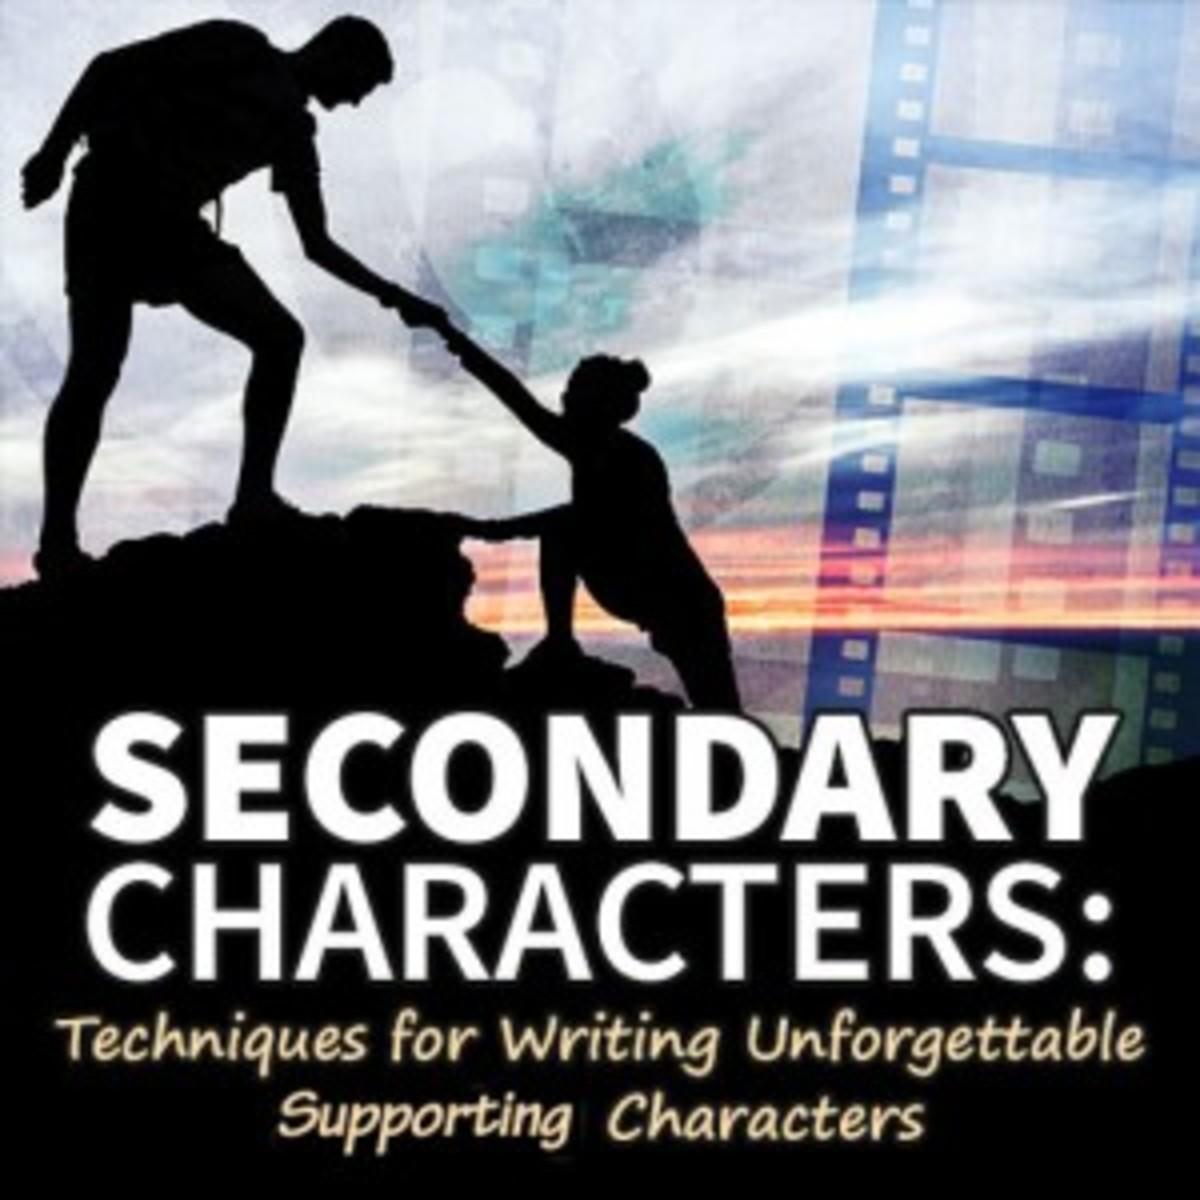 ws_secondarycharacter-500_medium-1